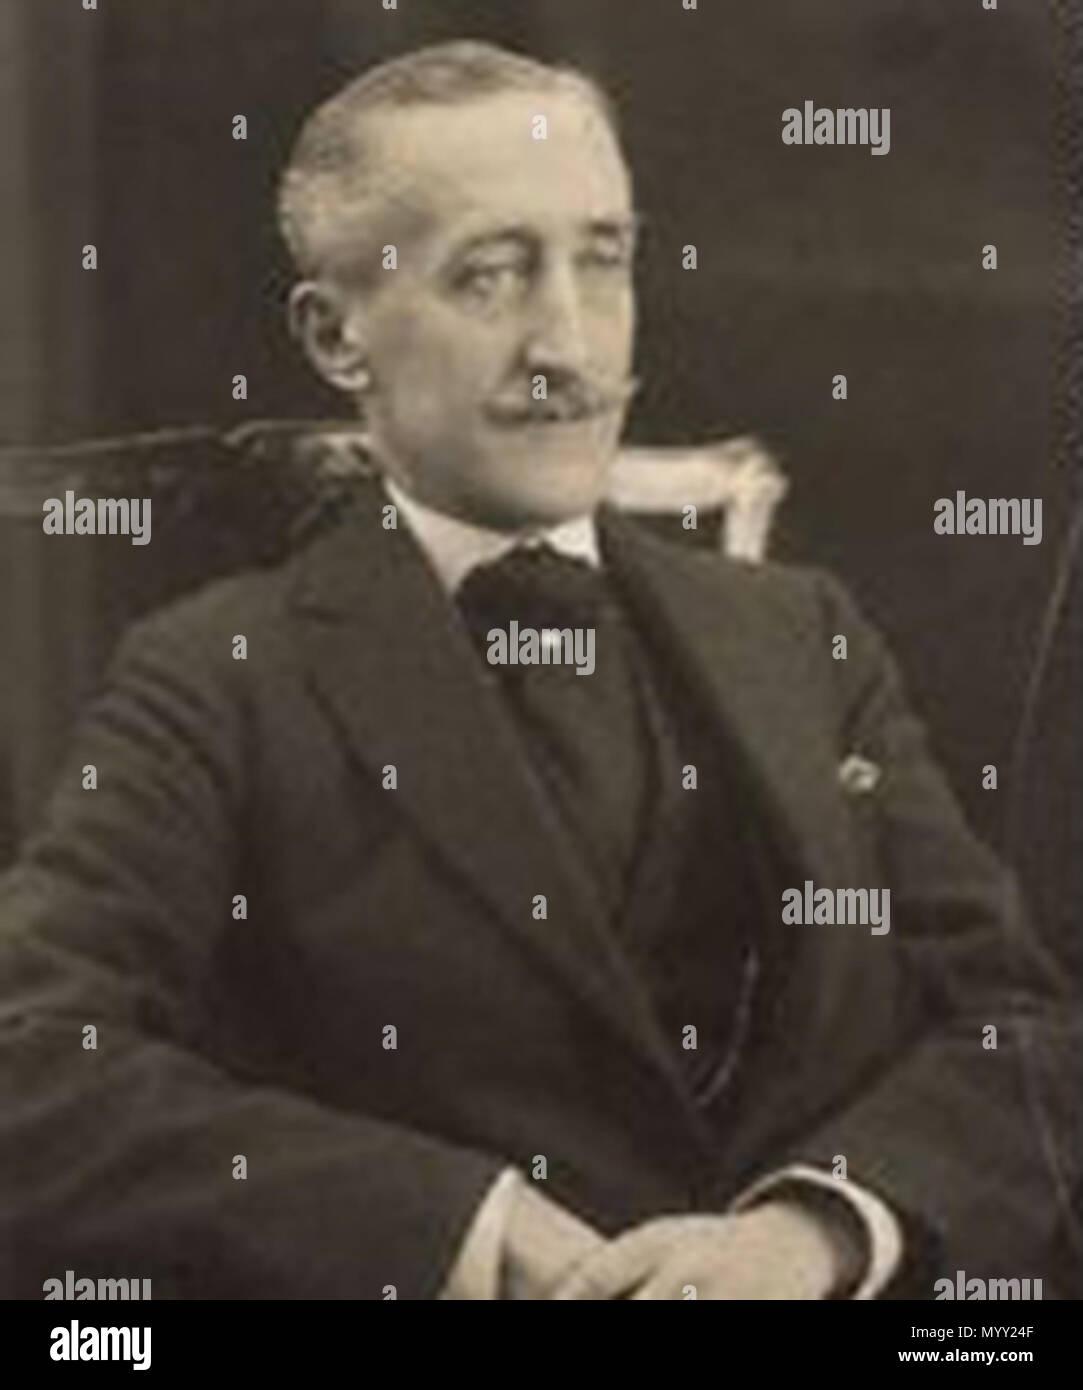 Freeman Freeman-Thomas, governor general of Canada   circa 1915